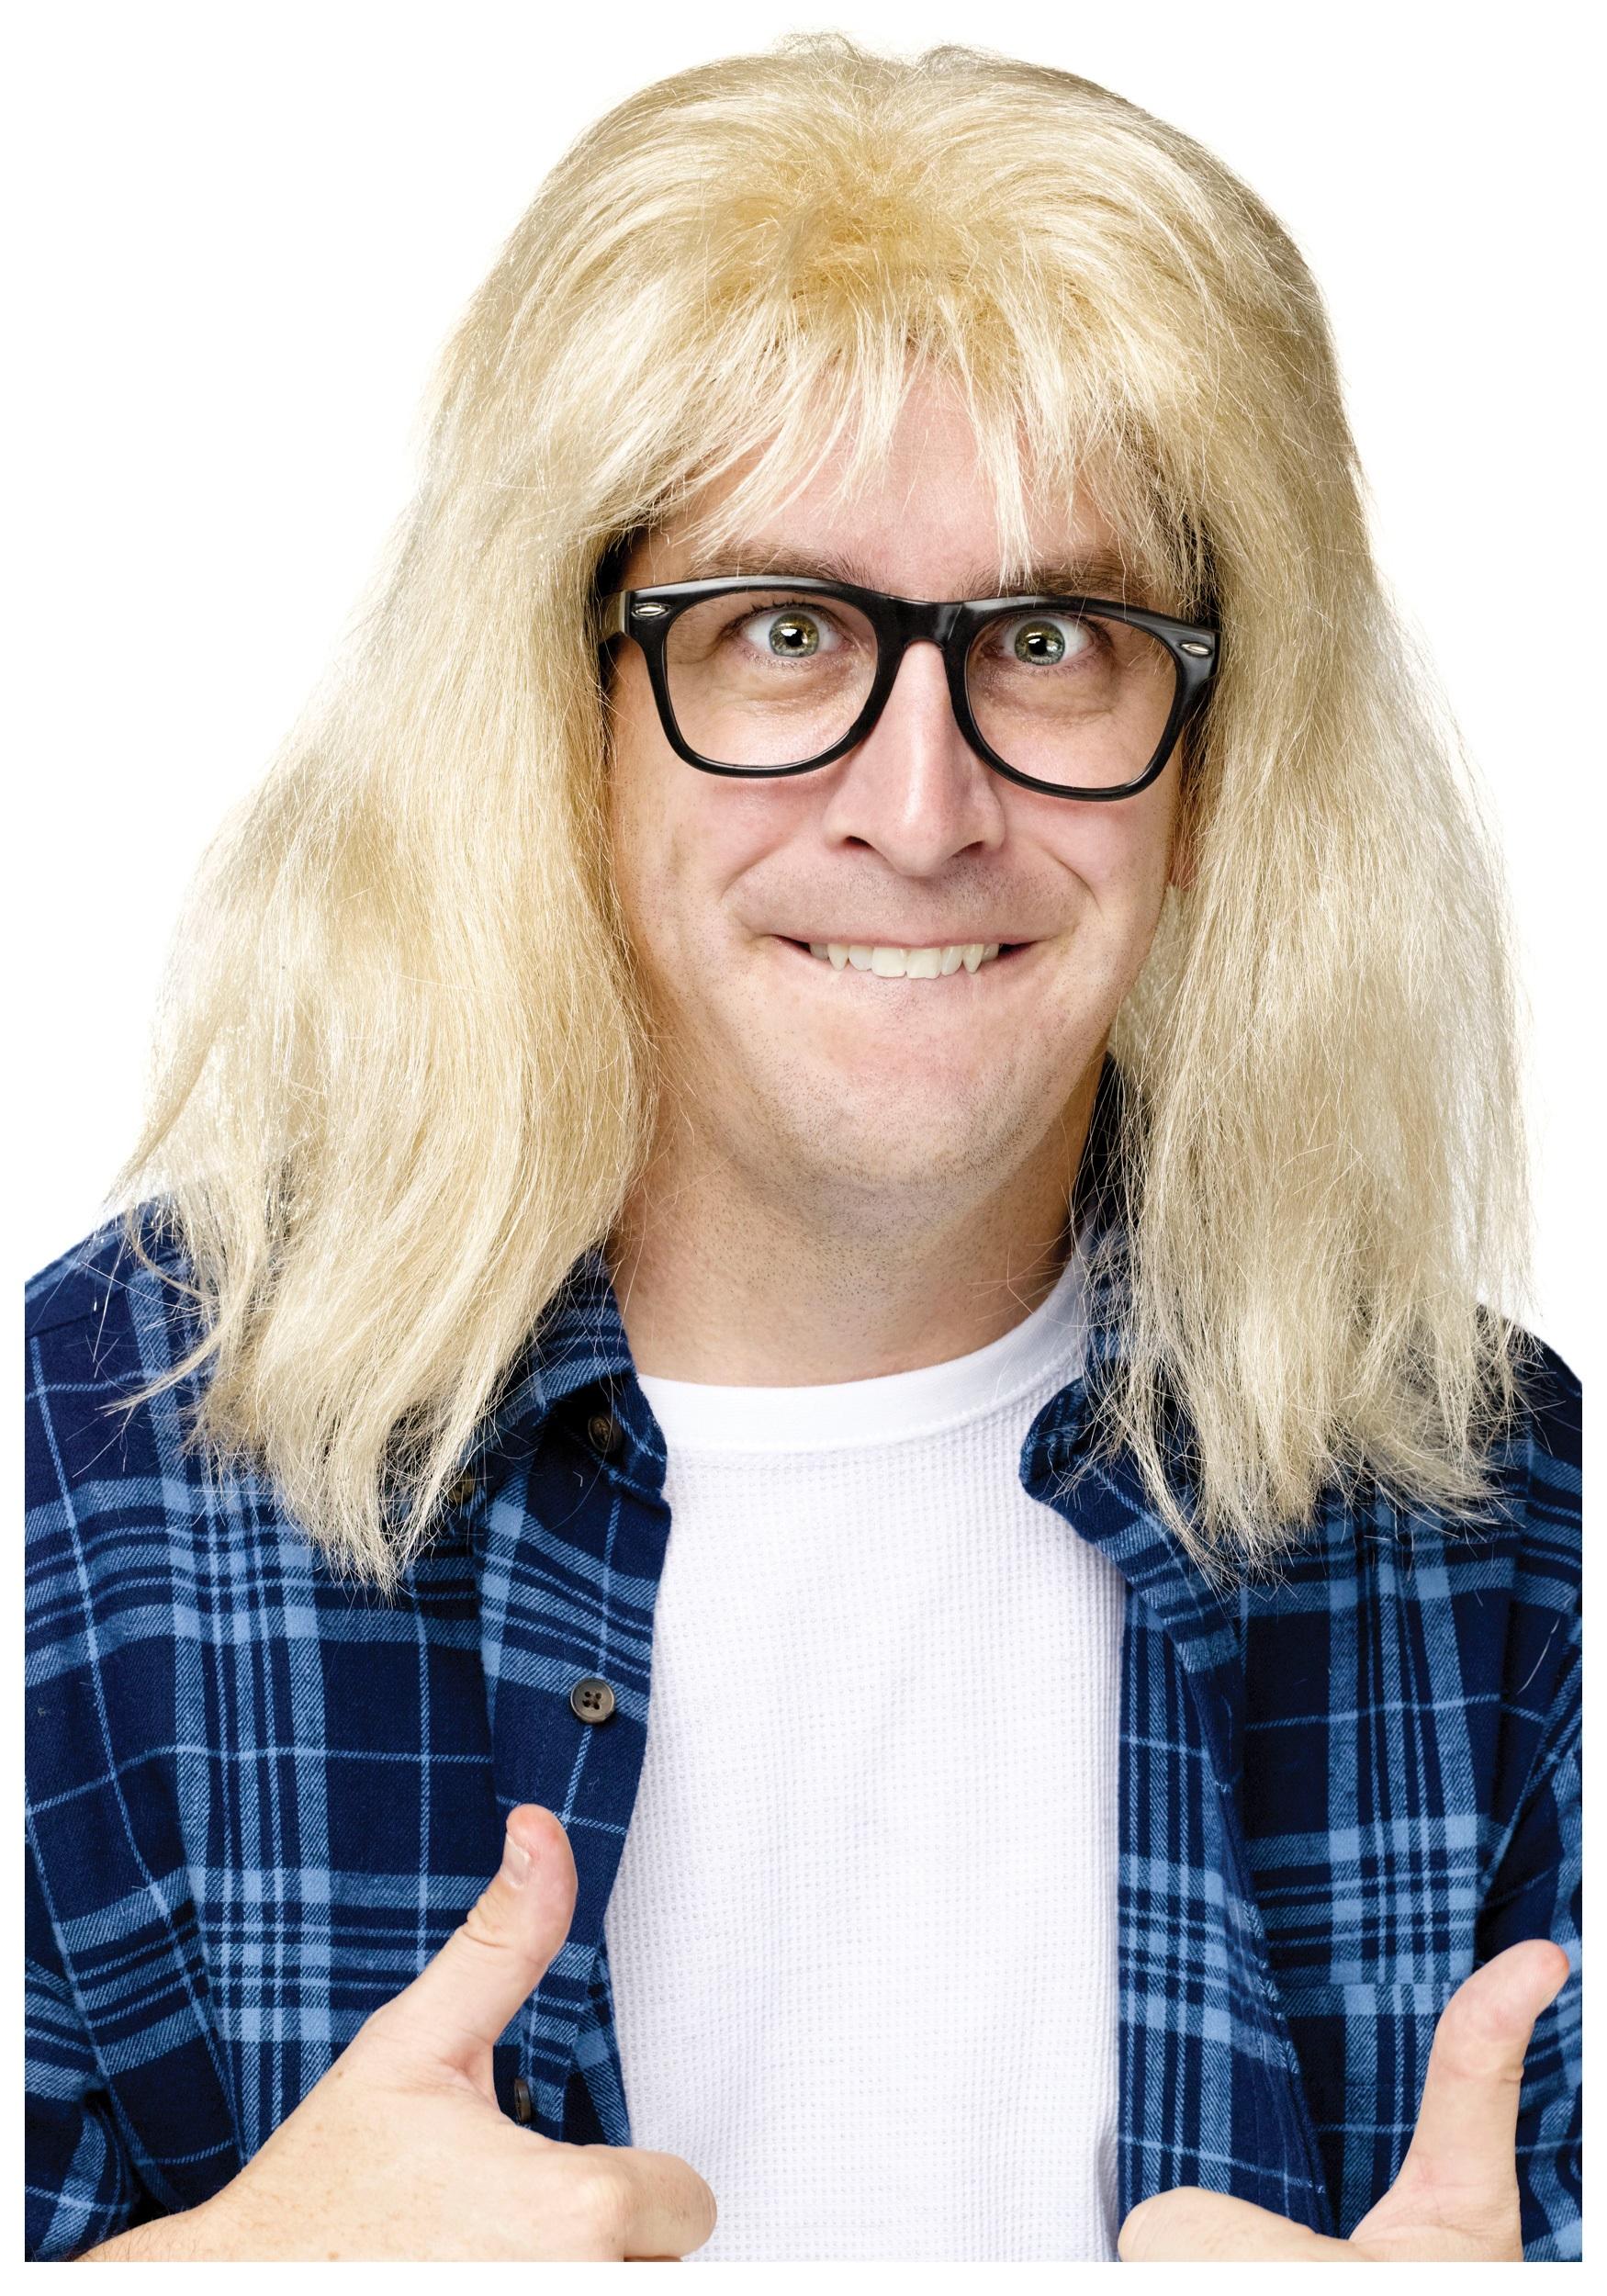 Garth Halloween Costume